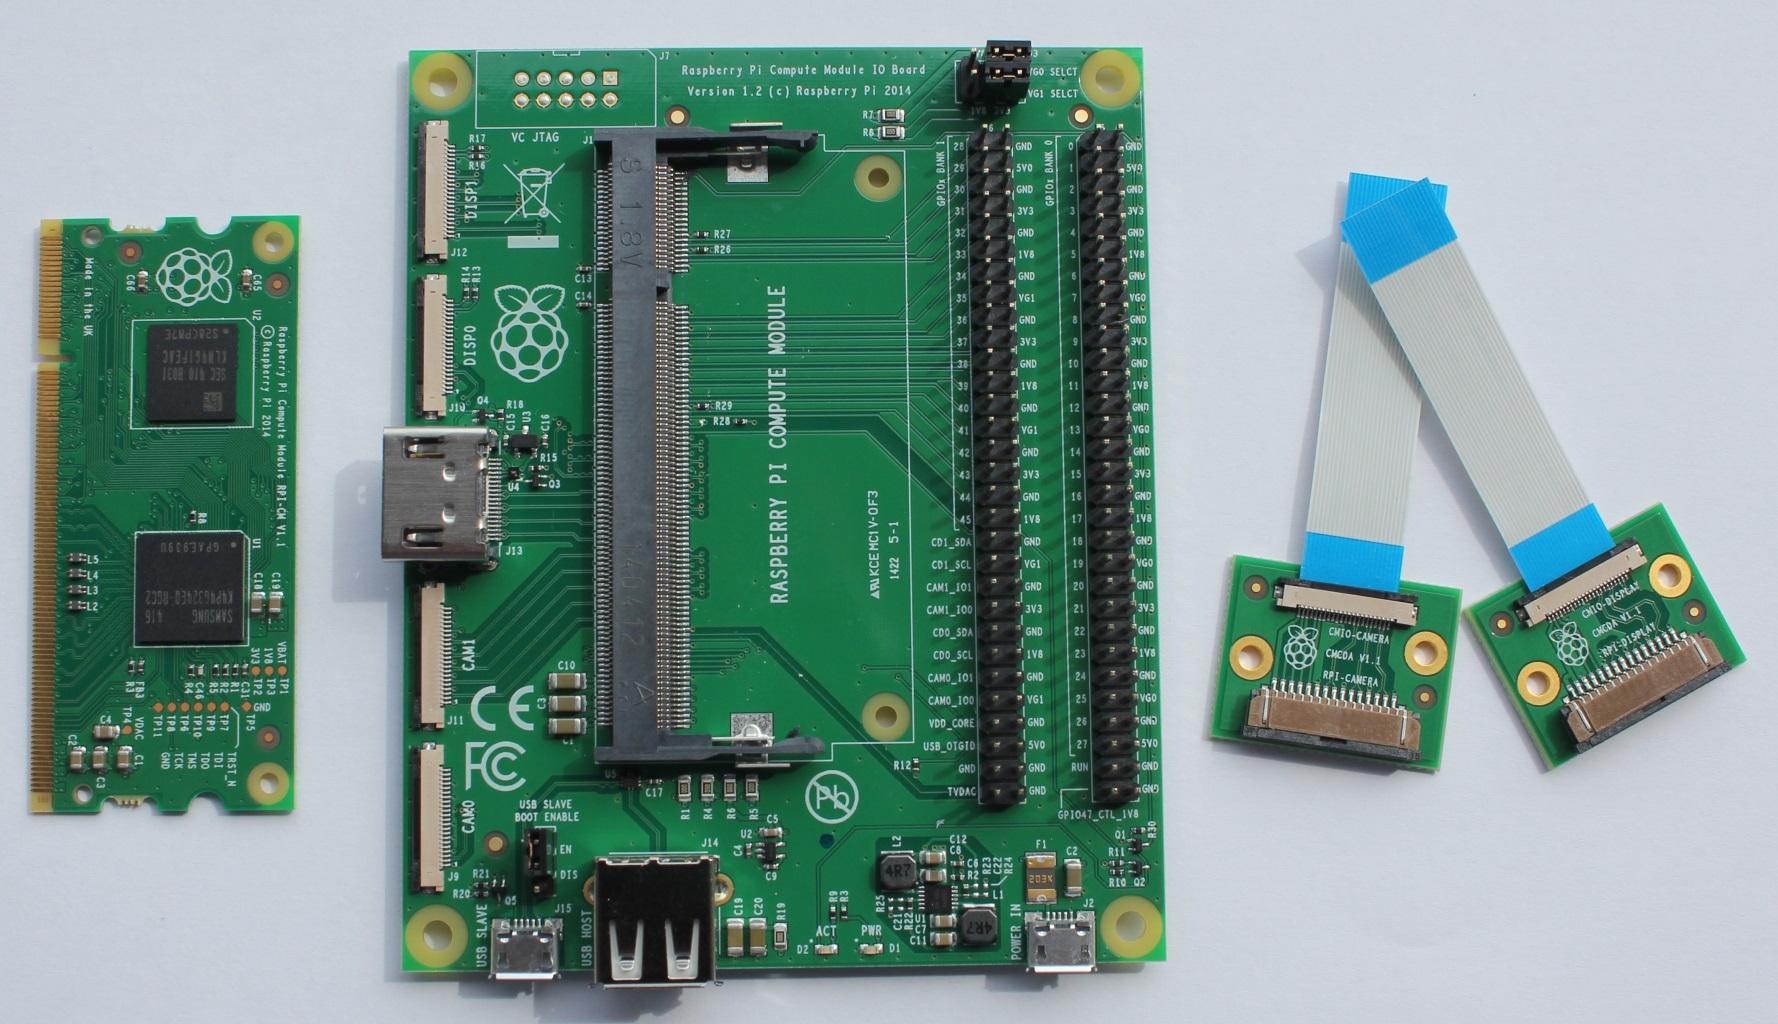 Awesome Wiringpi And The Rasbperry Pi Compute And Io Board Wiring Pi Wiring Cloud Filiciilluminateatxorg